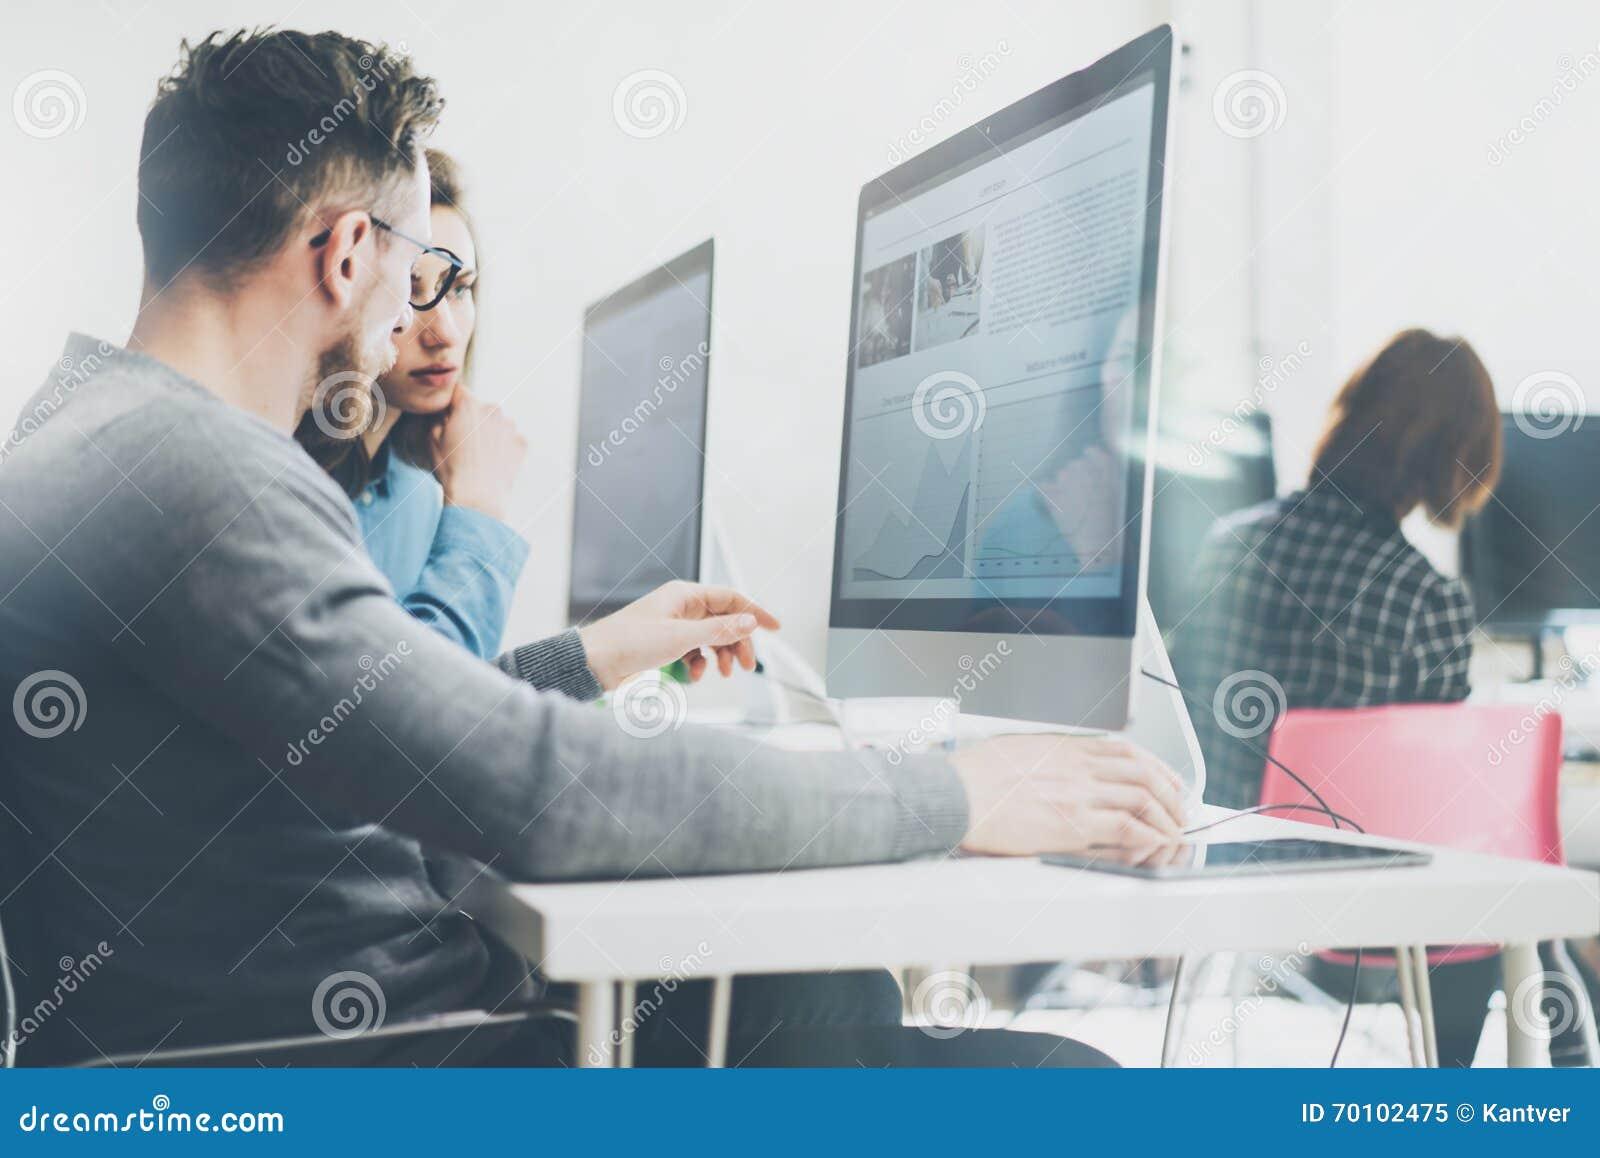 Coworking过程 照片年轻企业乘员组与新的起始的项目现代办公室一起使用 在木头的台式计算机